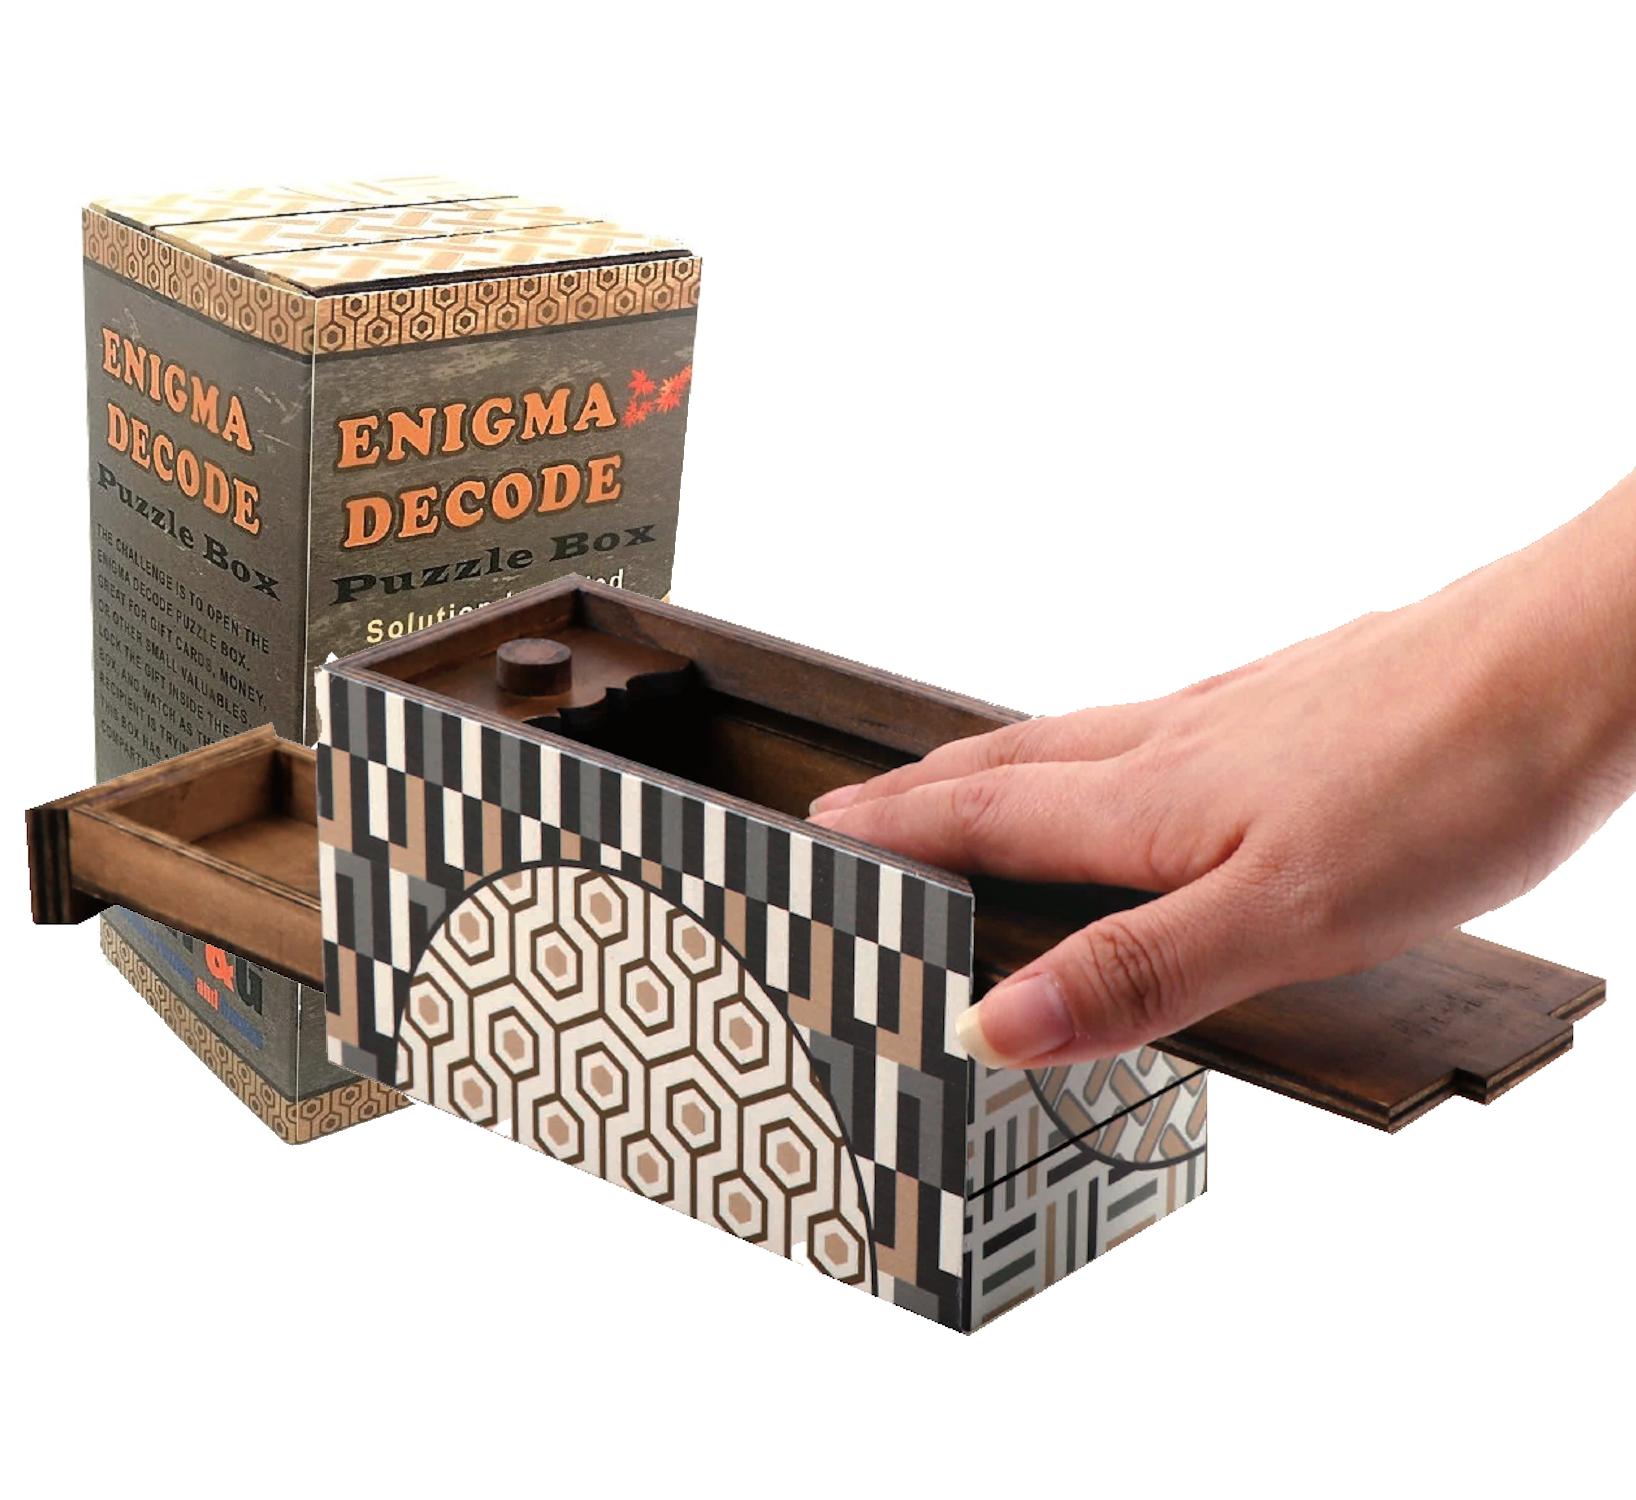 Enigma Decode Puzzle Box Money Gift Giving Secret Box